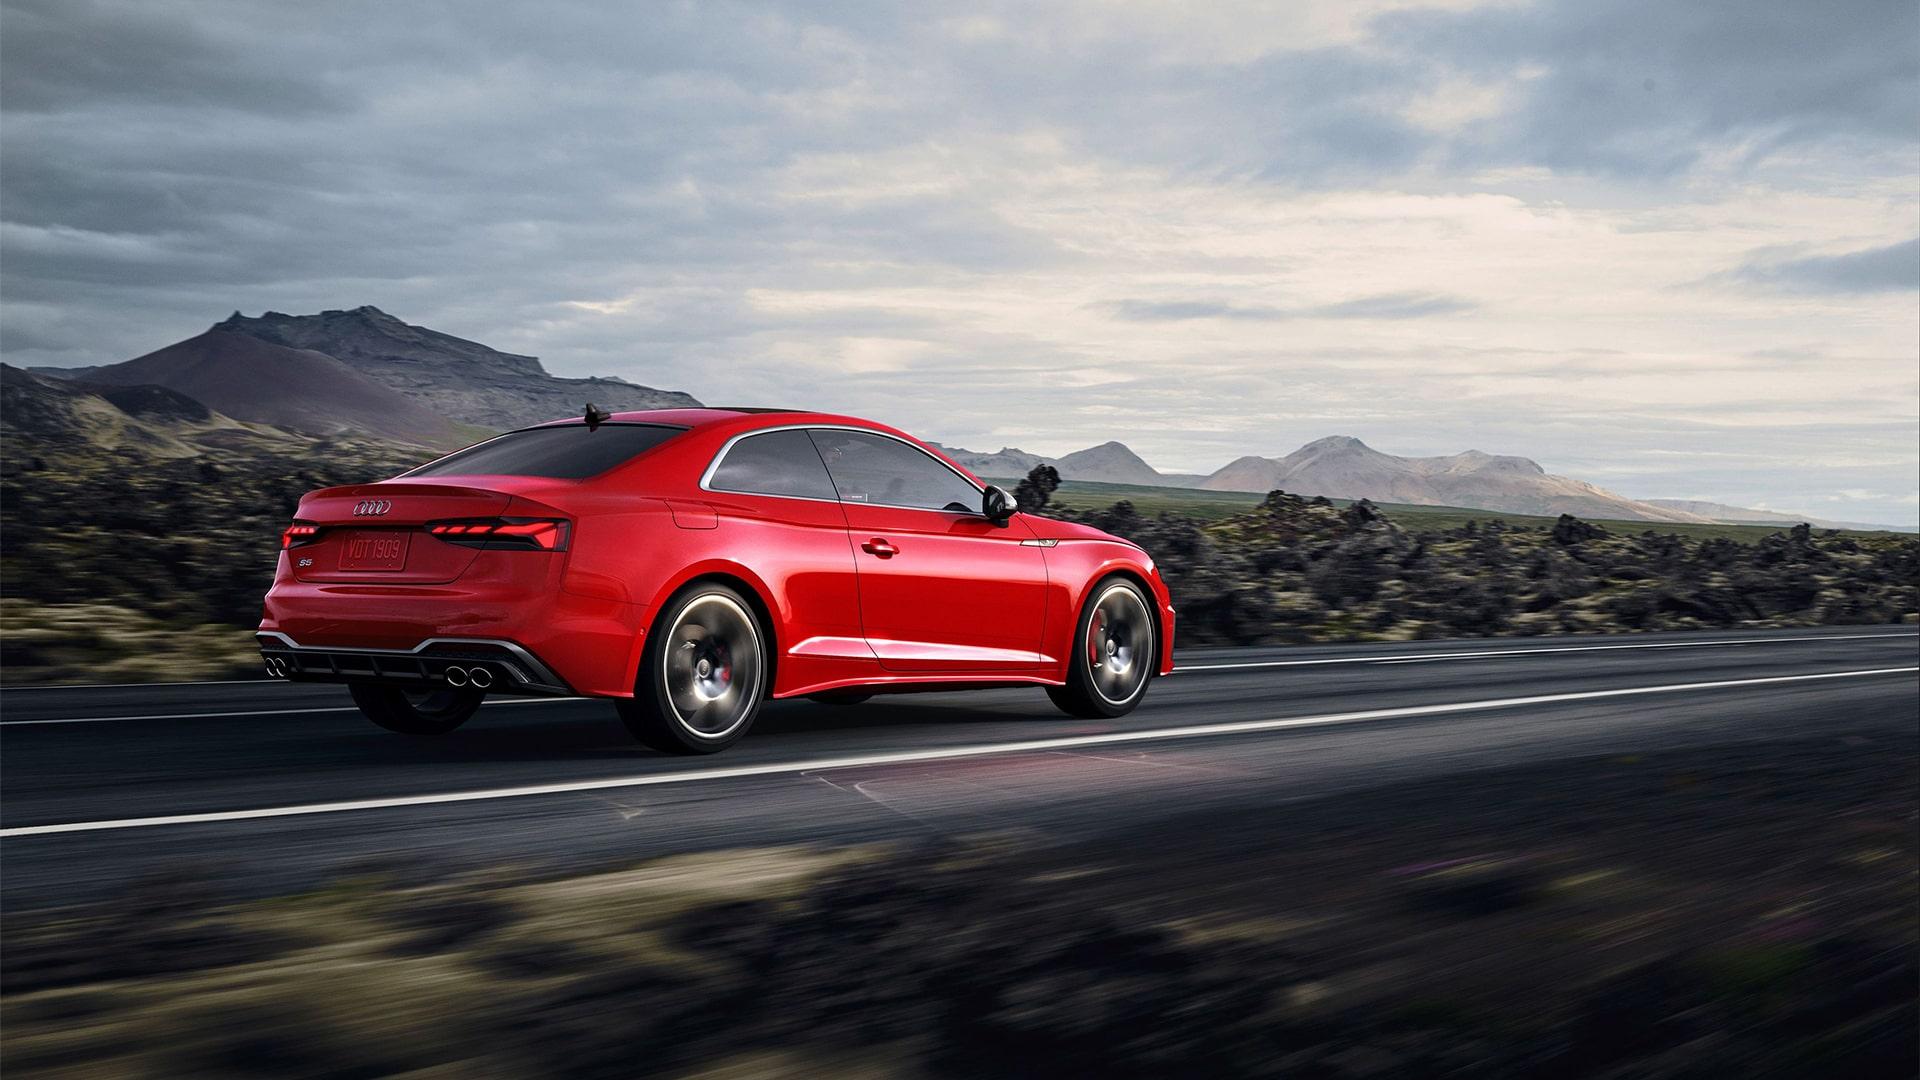 2021 Audi S5 Coupe Luxury Coupe Audi Usa